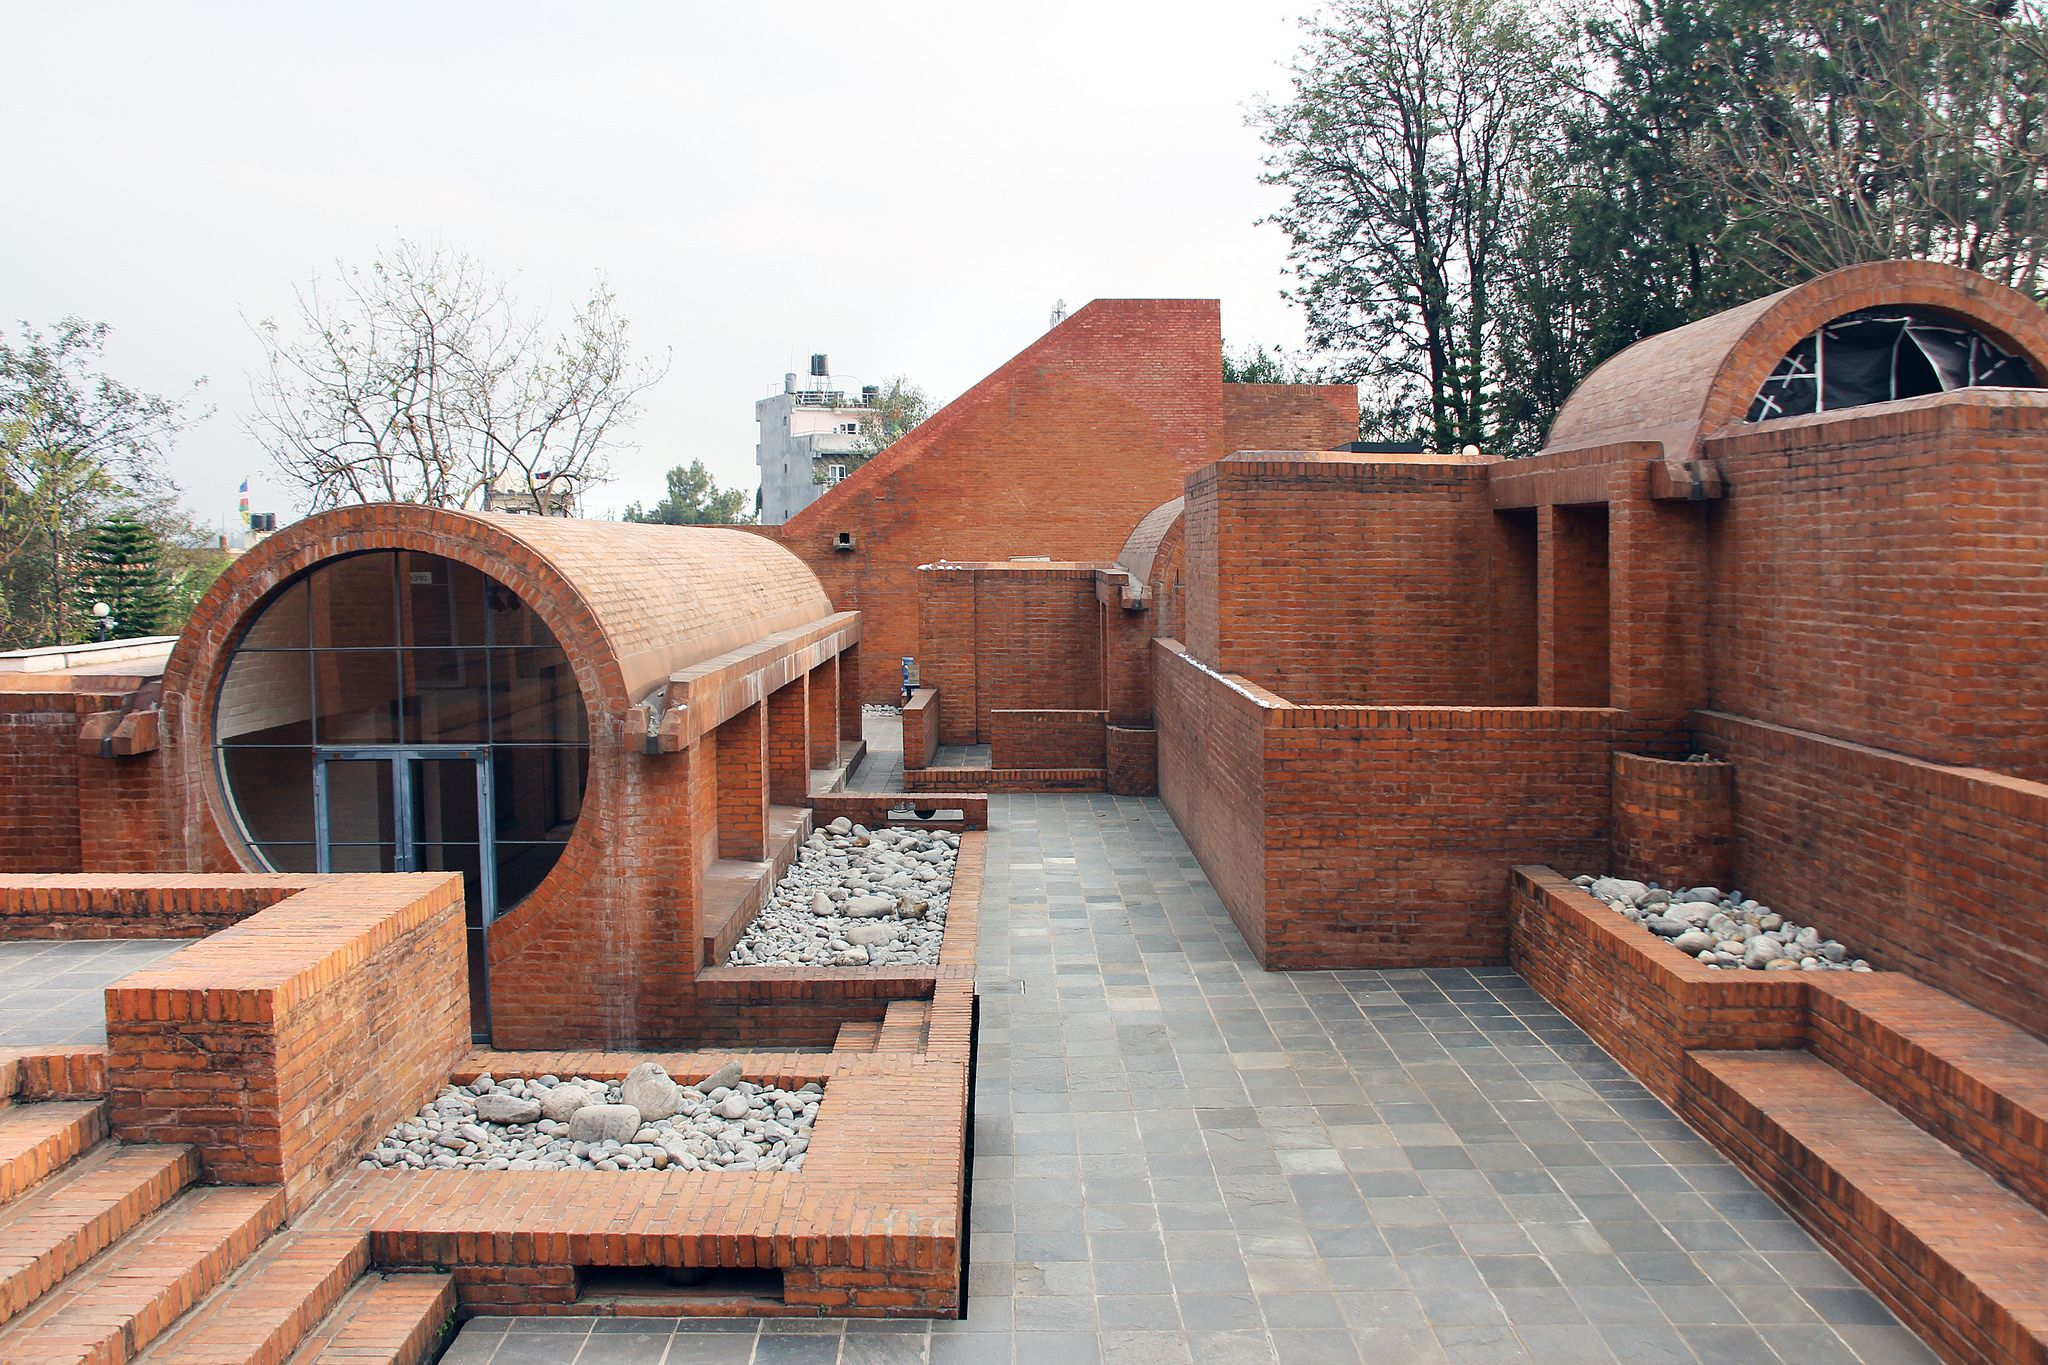 Img_7180 Architecture # Rogelio Muebles San Rafael